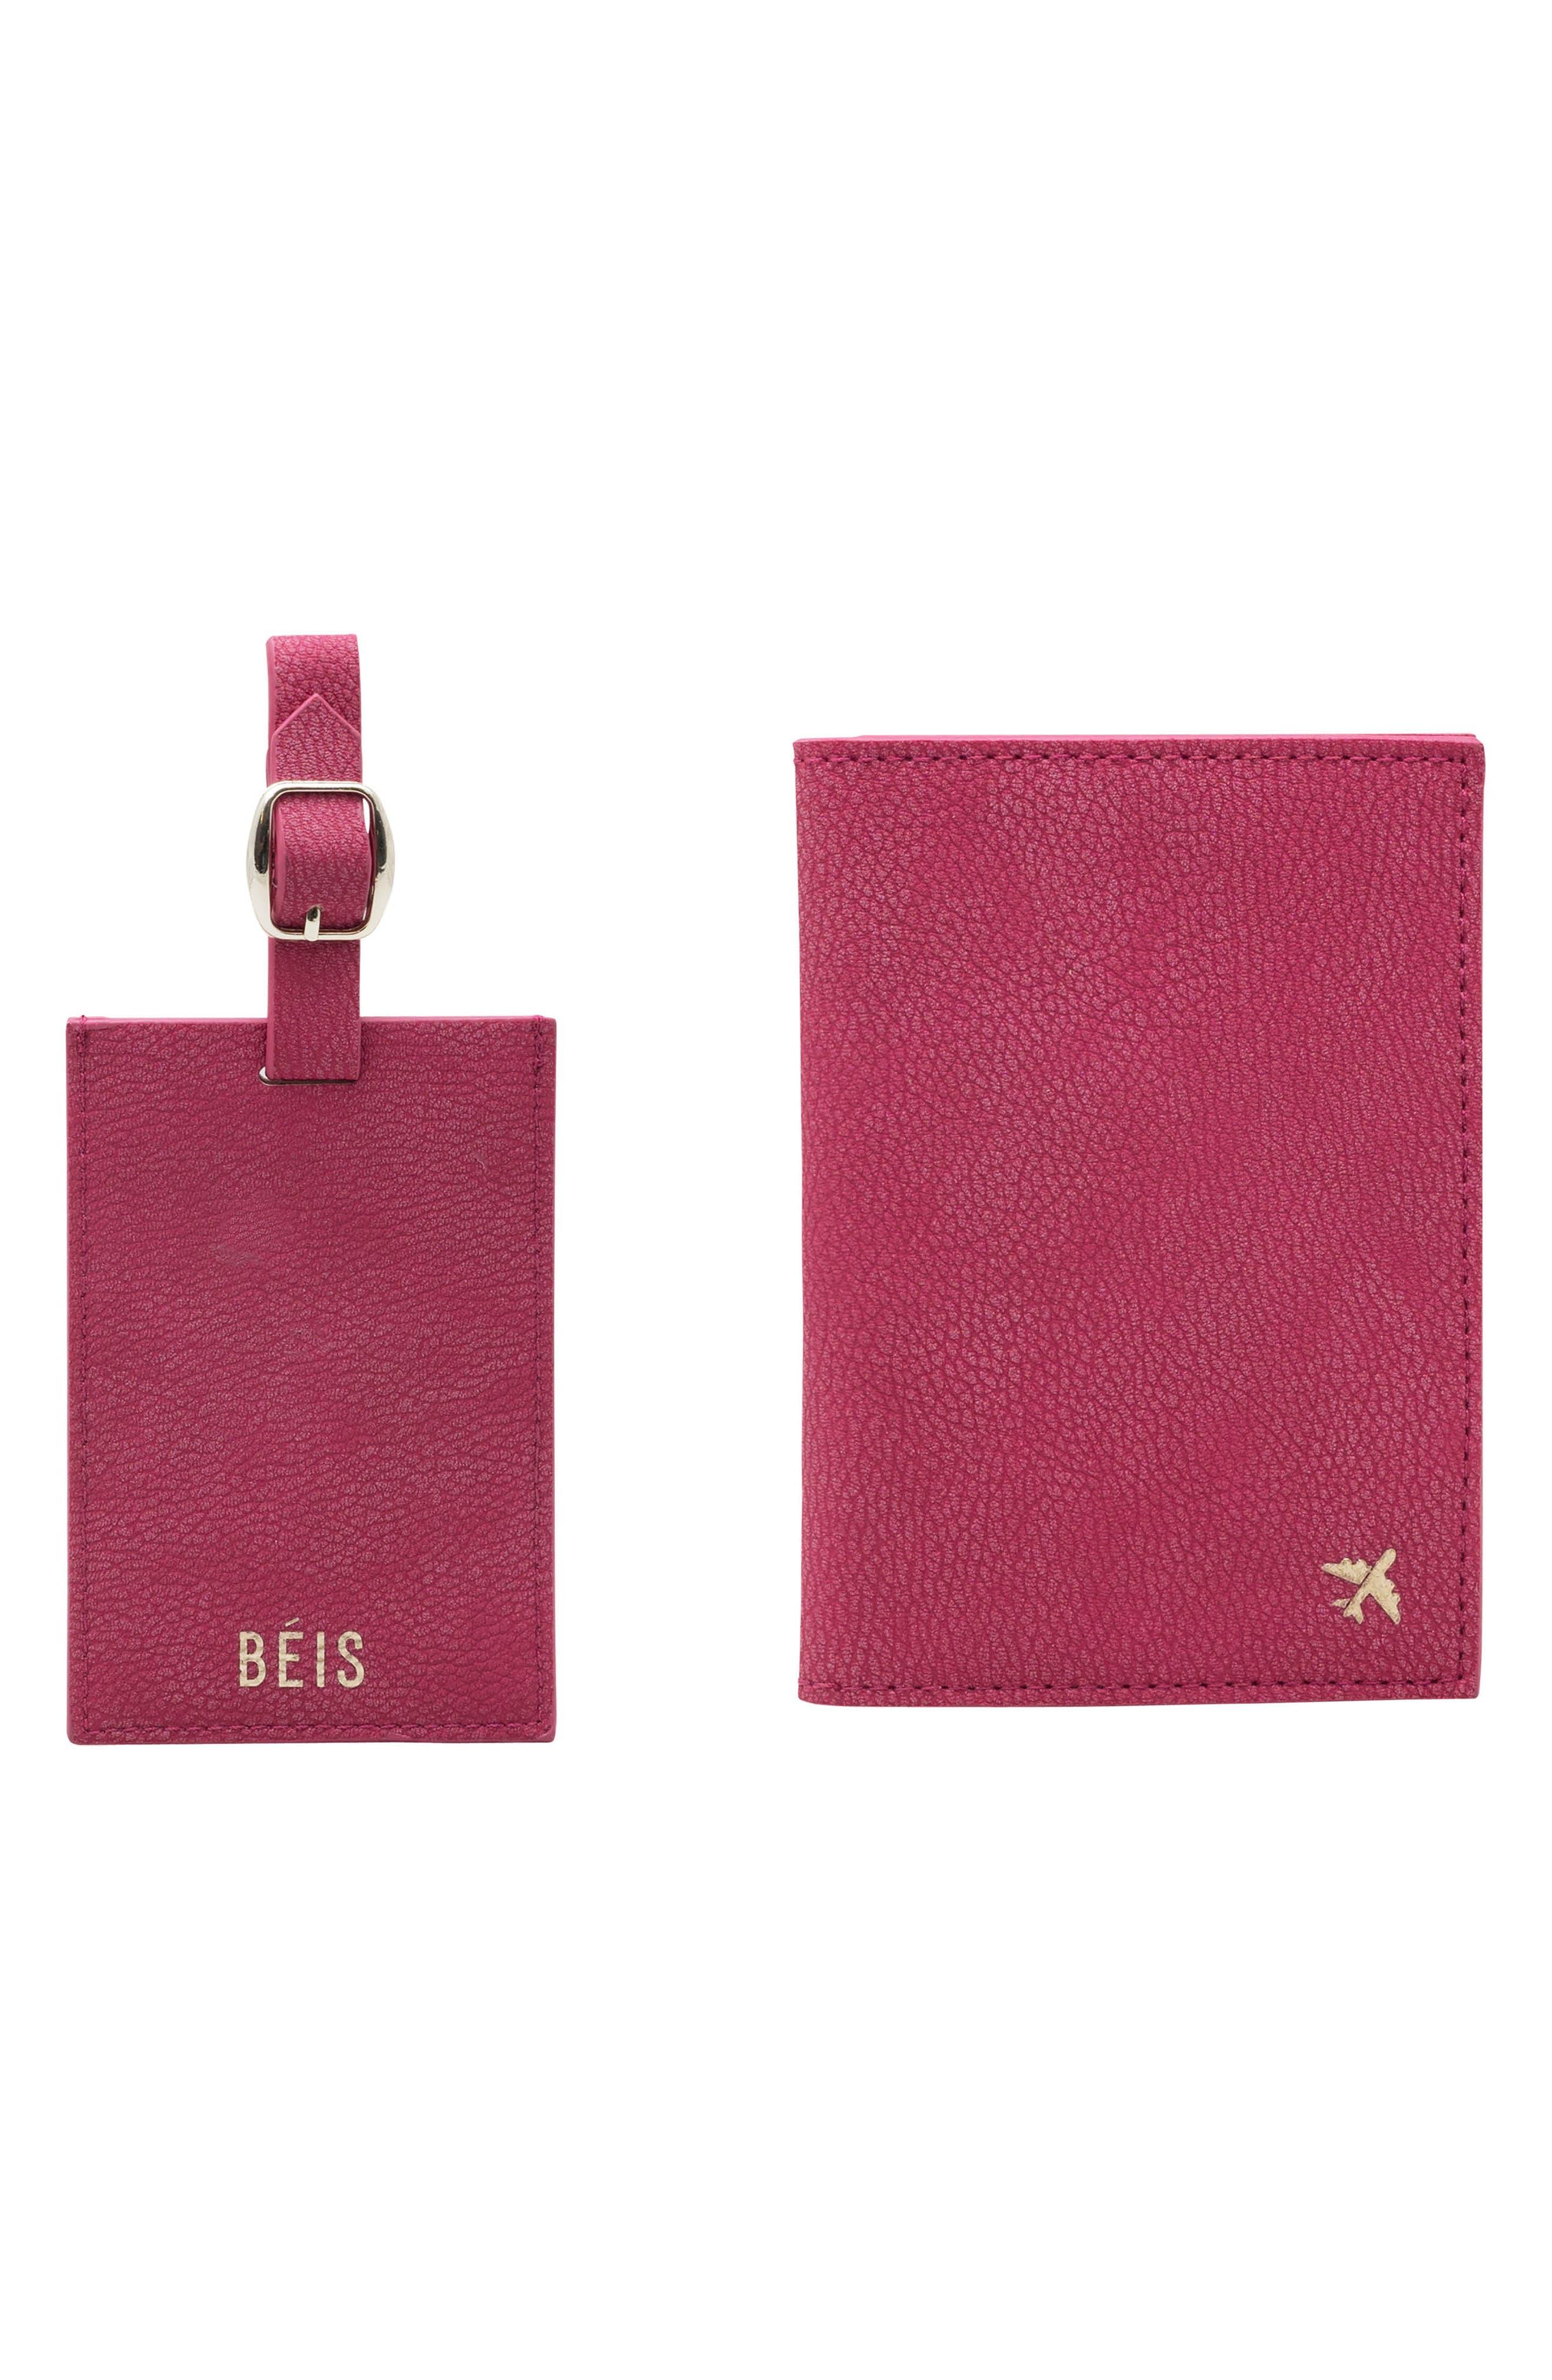 BÉIS Travel Luggage Tag & Passport Holder Set, Main, color, 653